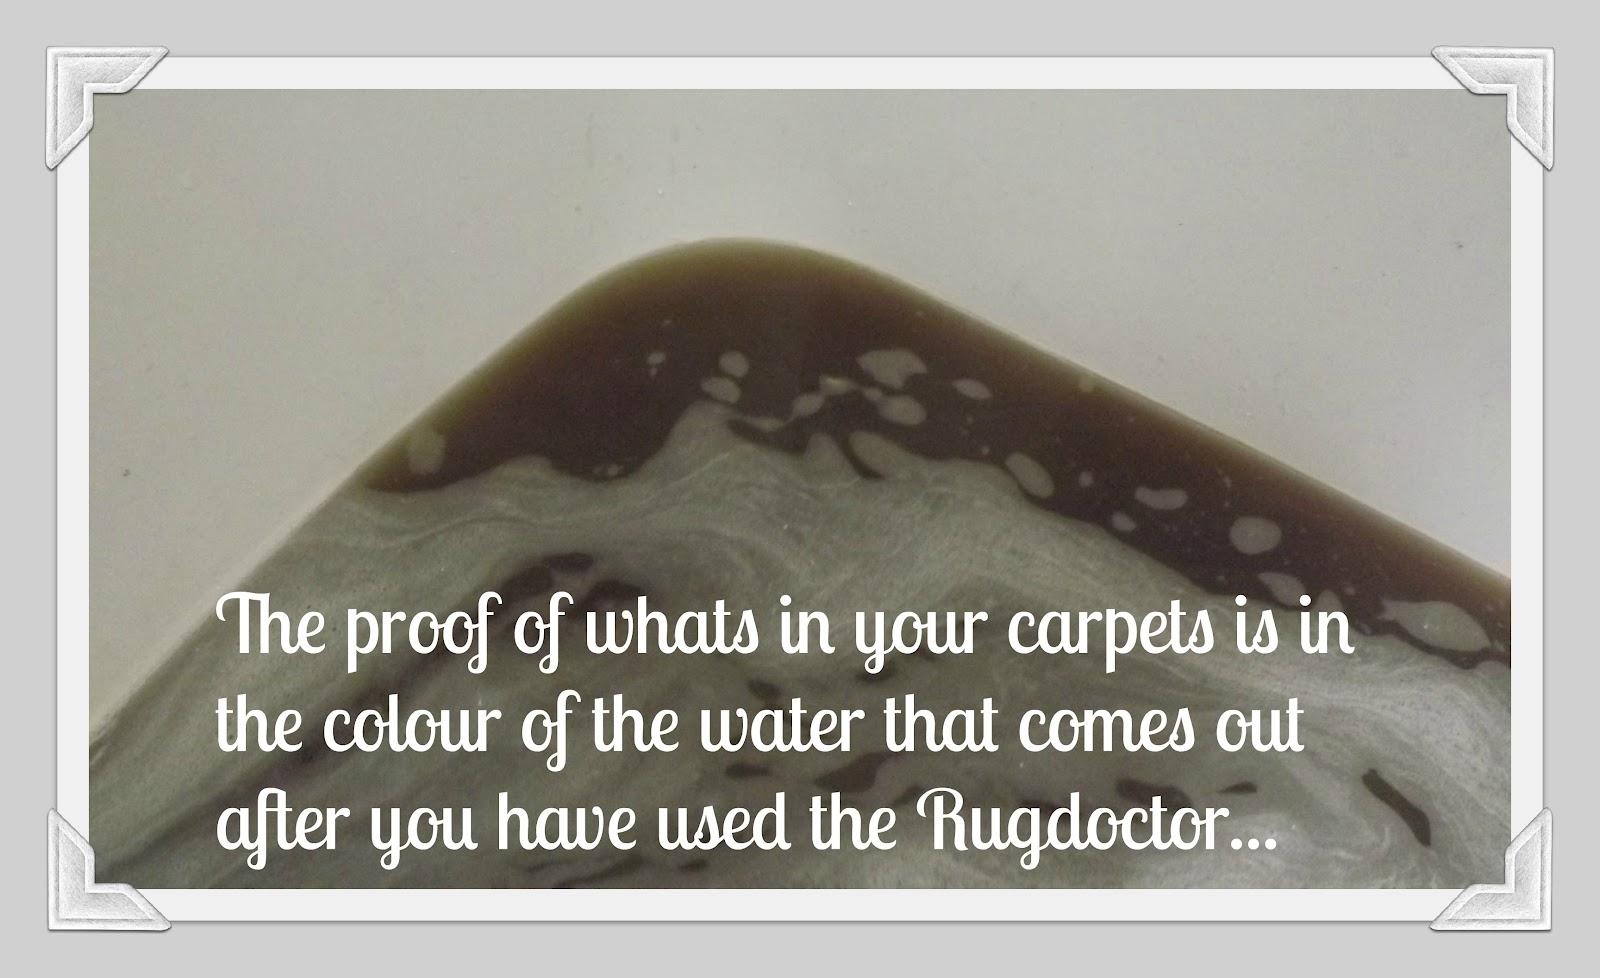 Rugdoctor, Review, Rugdoctor Carpet Cleaner, Carpet Cleaning, Dirt, Dirt  Removal,